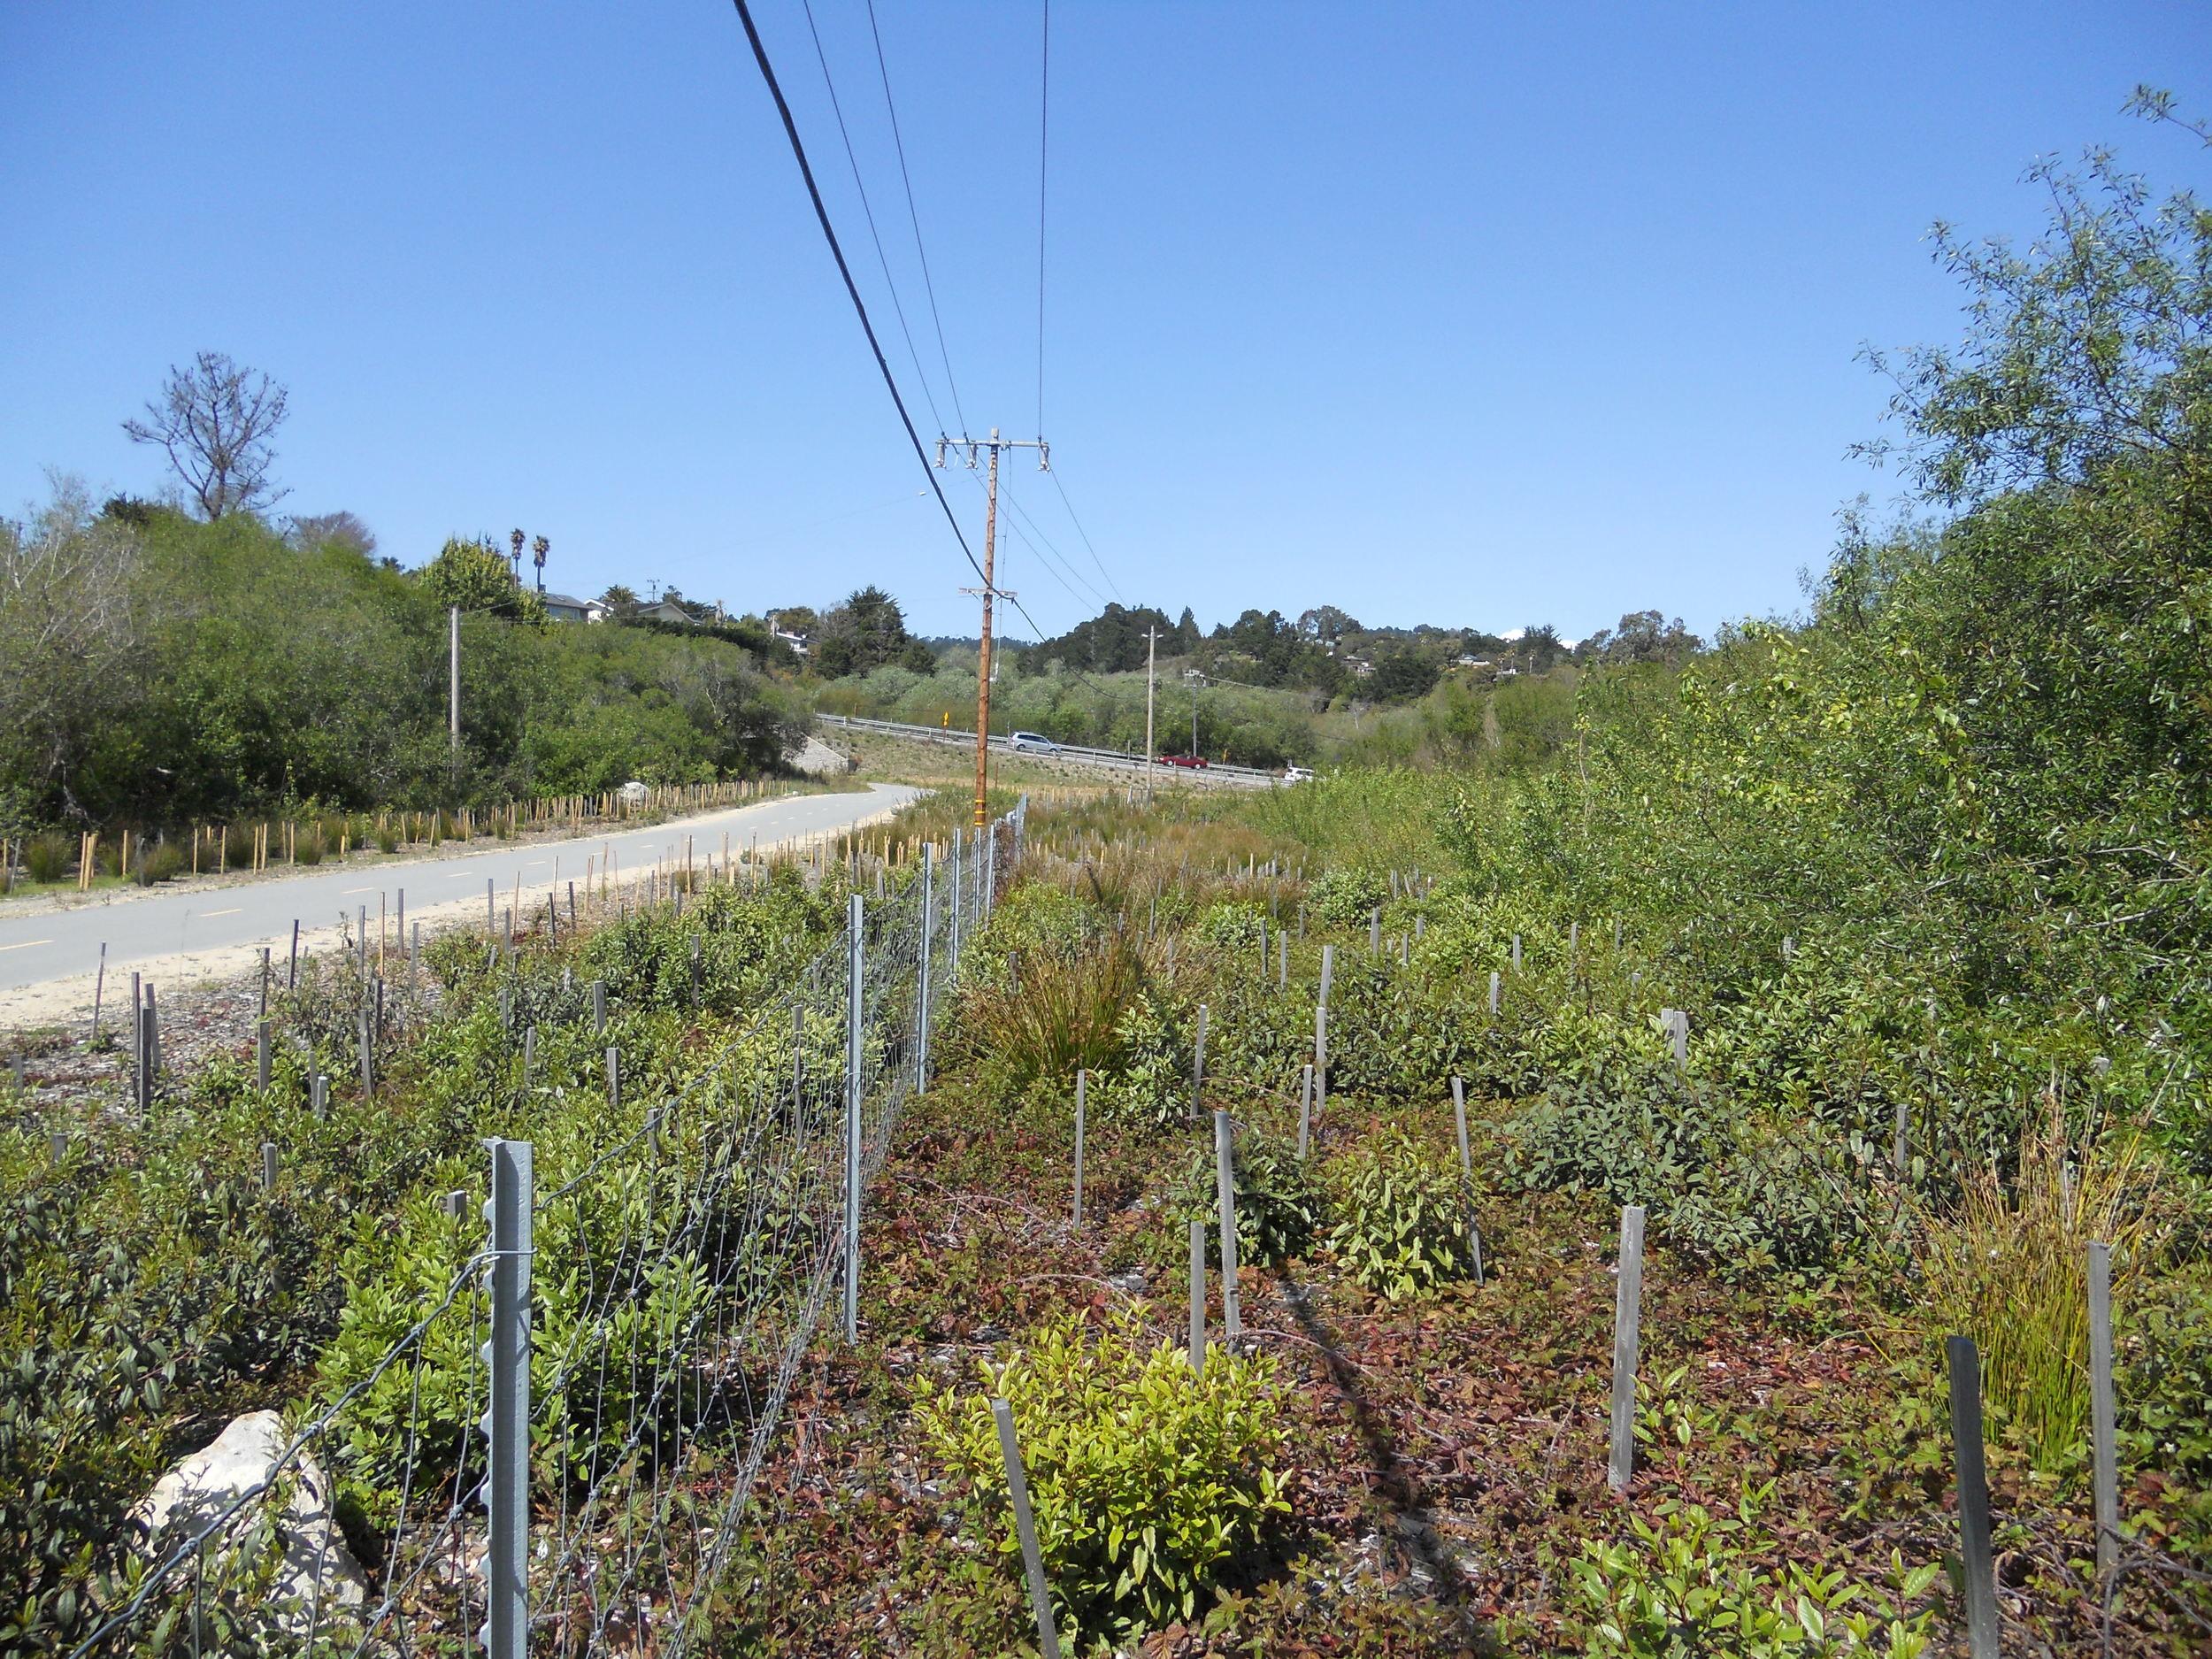 Carmel Hill and River Class I Bicycle Trail Riparian Restoration Progress (March 5, 2012)